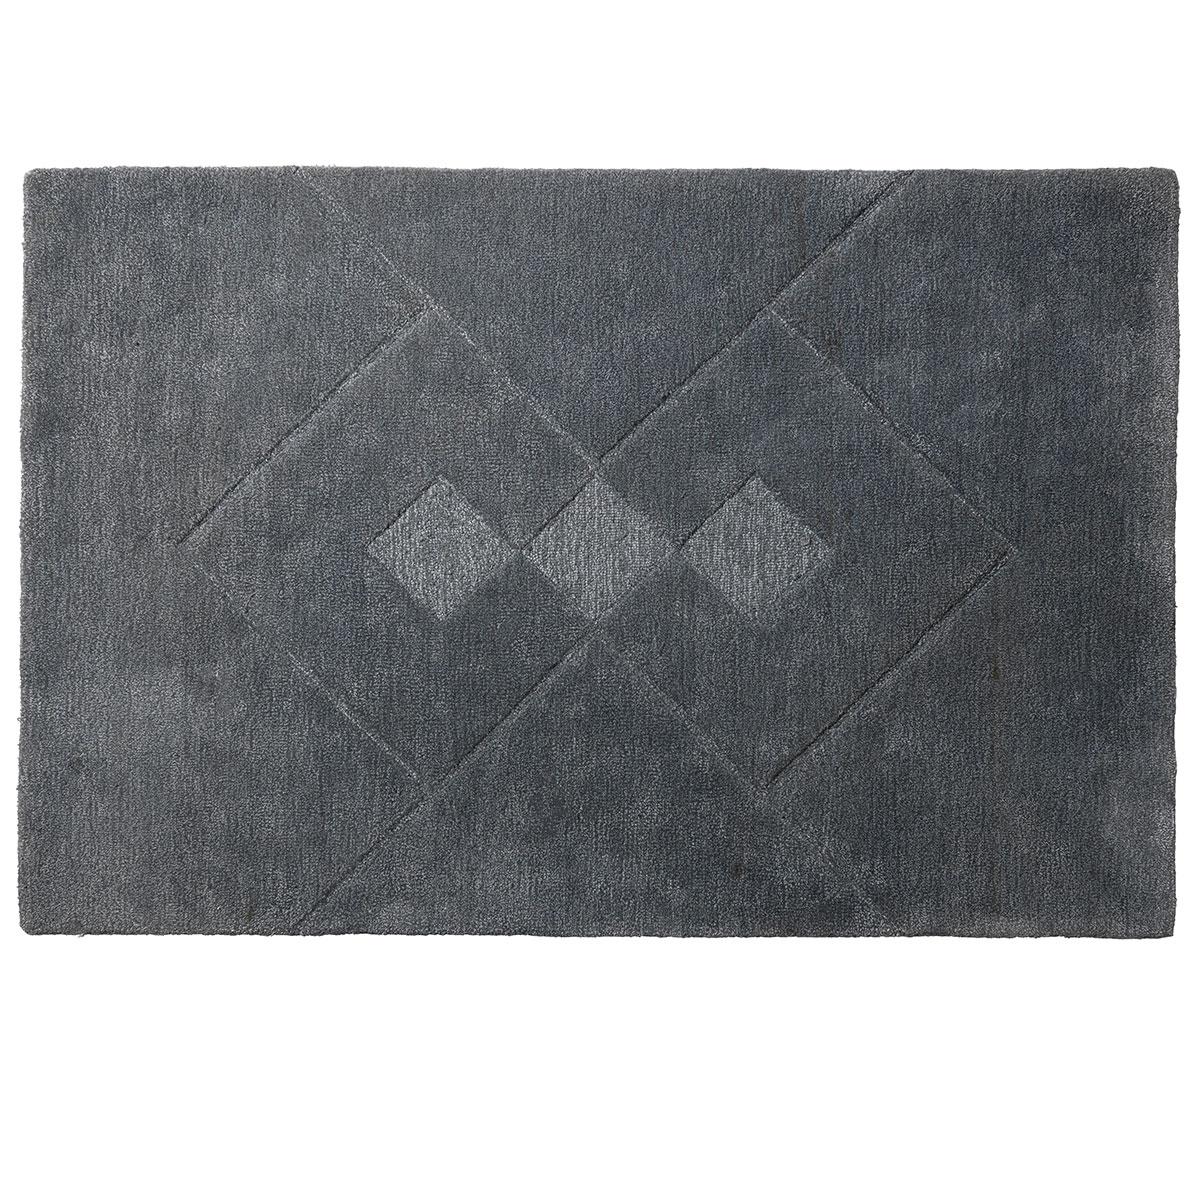 Image of   Bettina Juul Eilersen gulvtæppe - R7 Hera - 170 x 240 cm - Grå